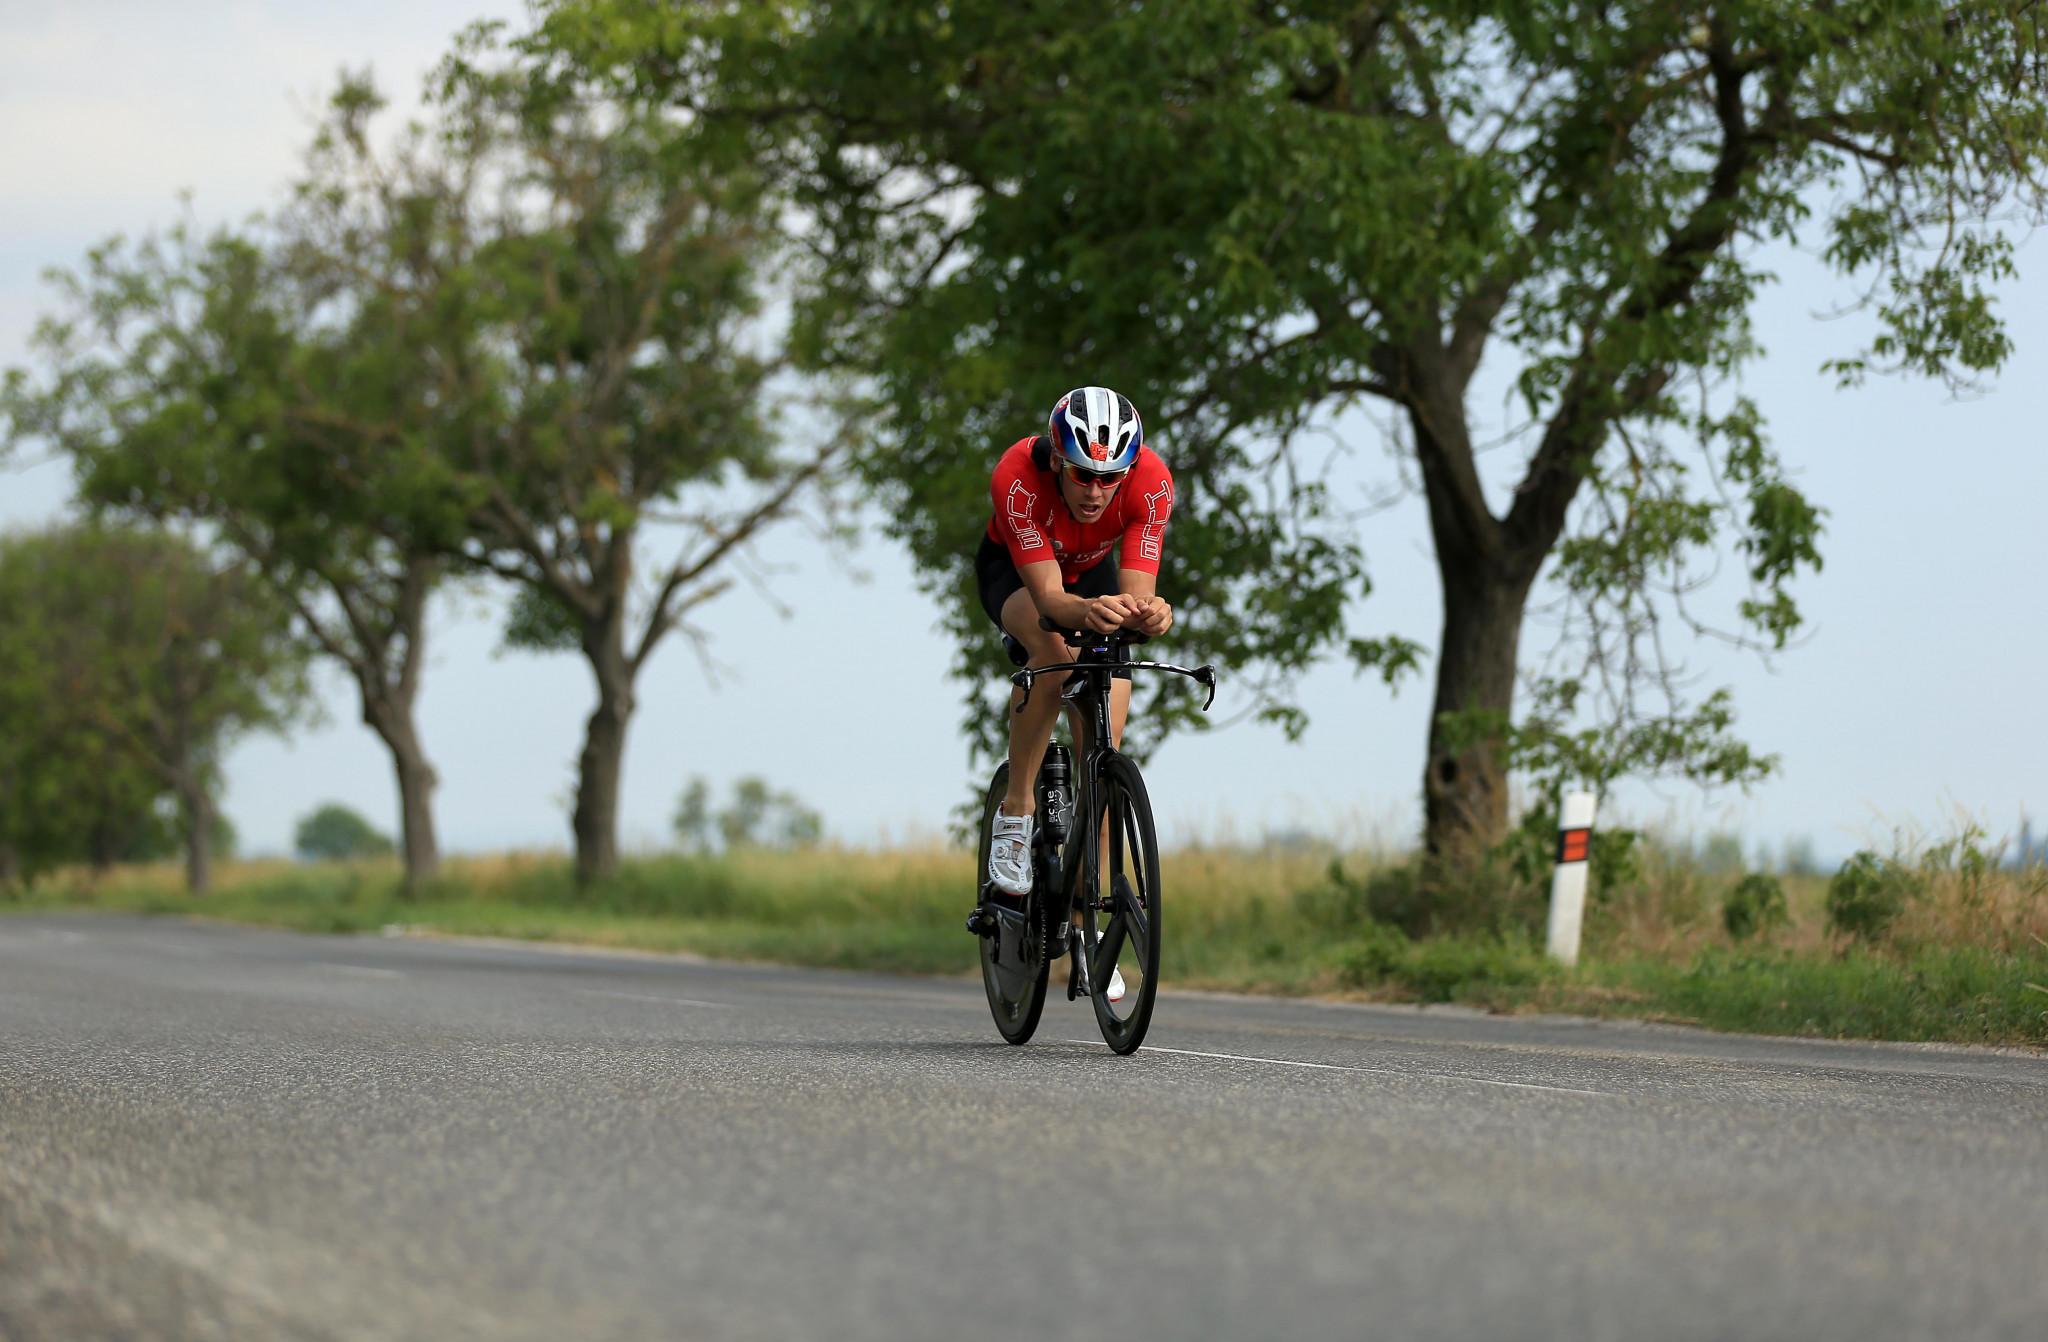 Varga and Coldwell win elite titles at European Triathlon Championships in Tartu